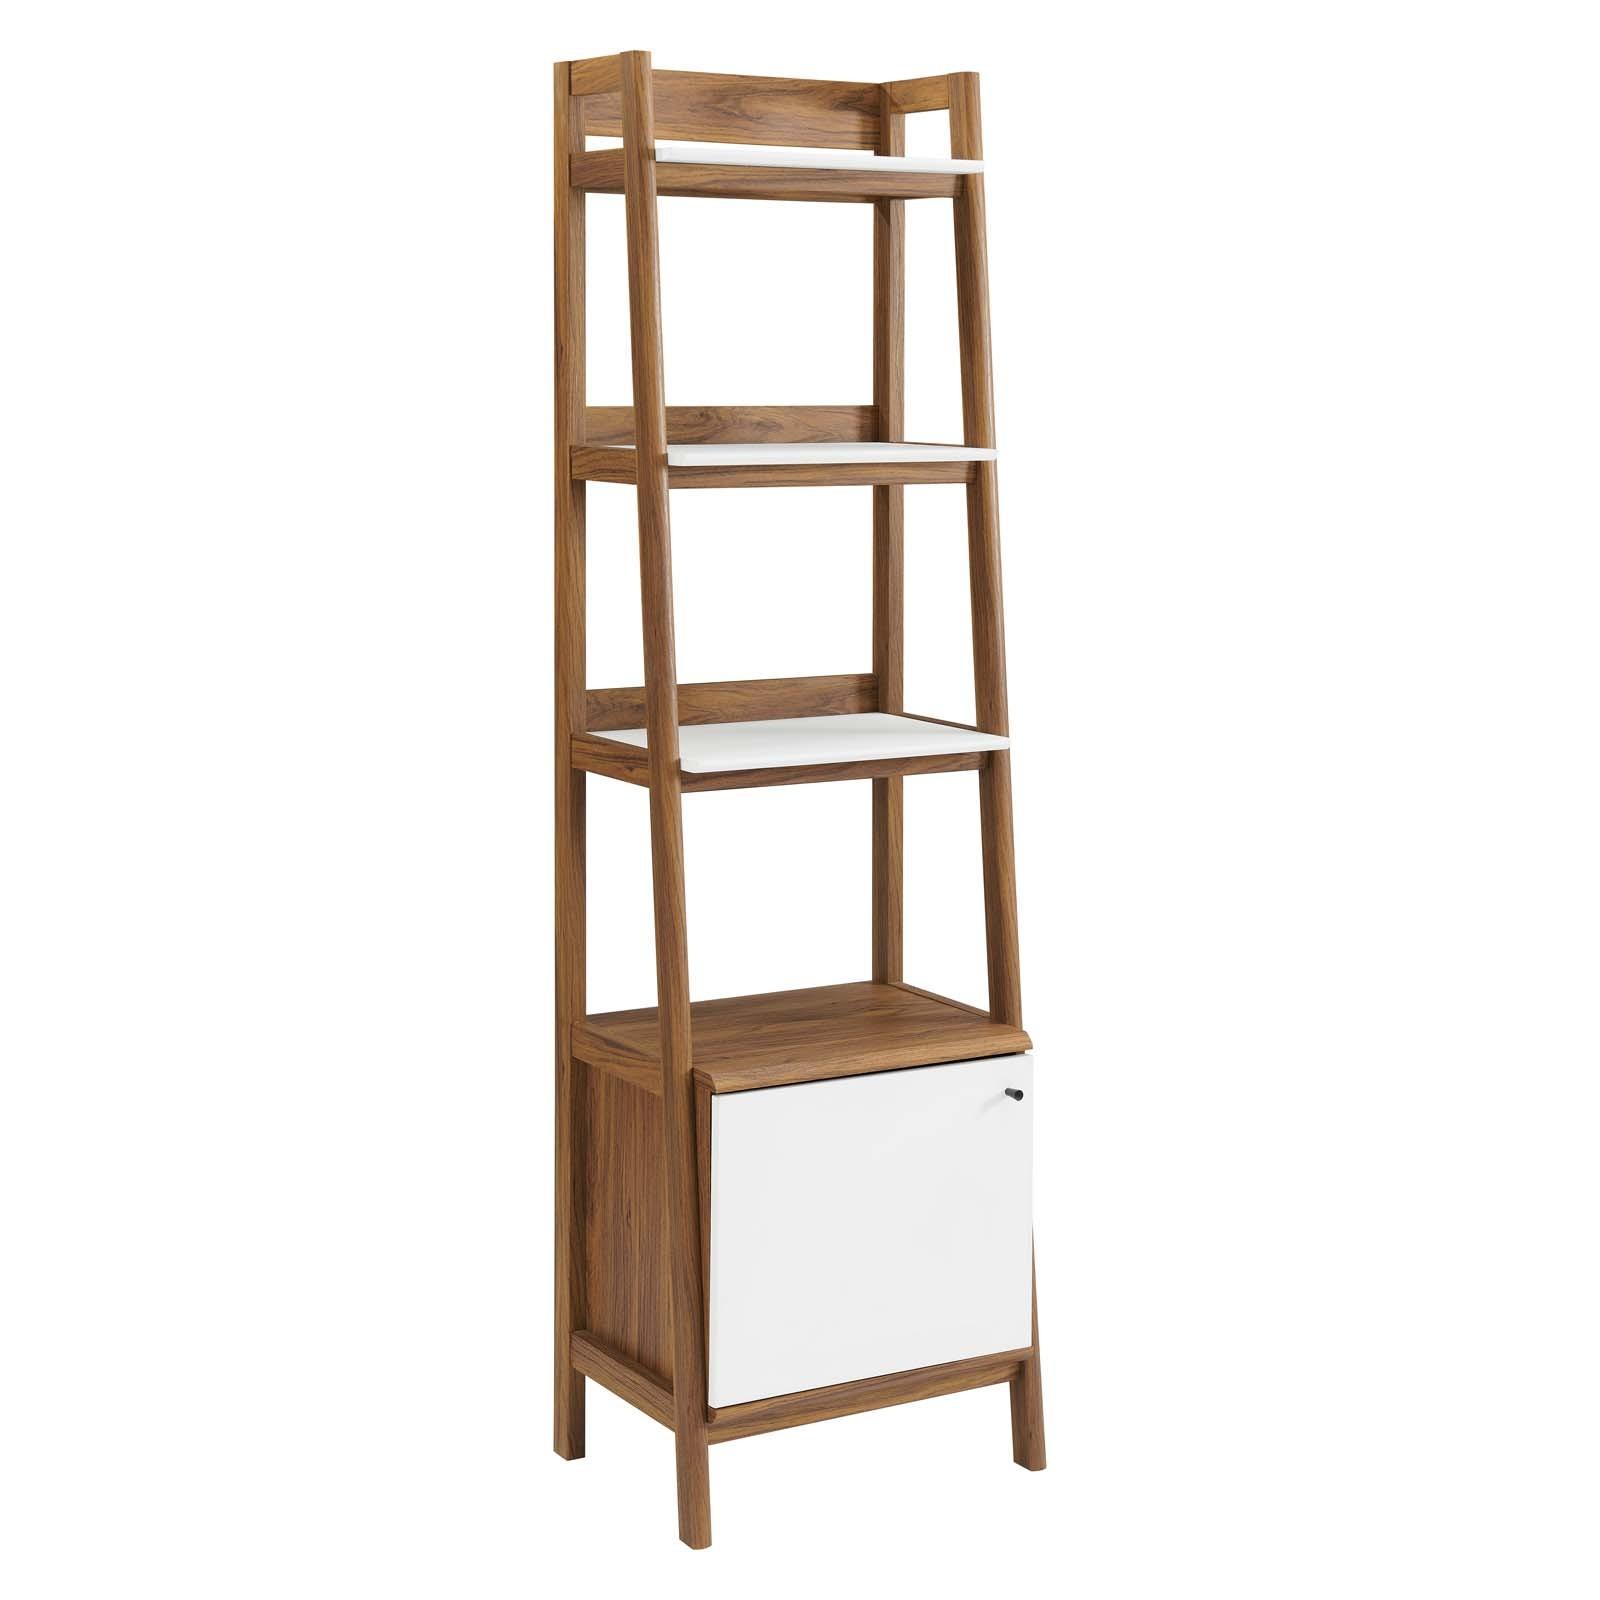 "Bixby 21"" Bookshelf in Walnut White"